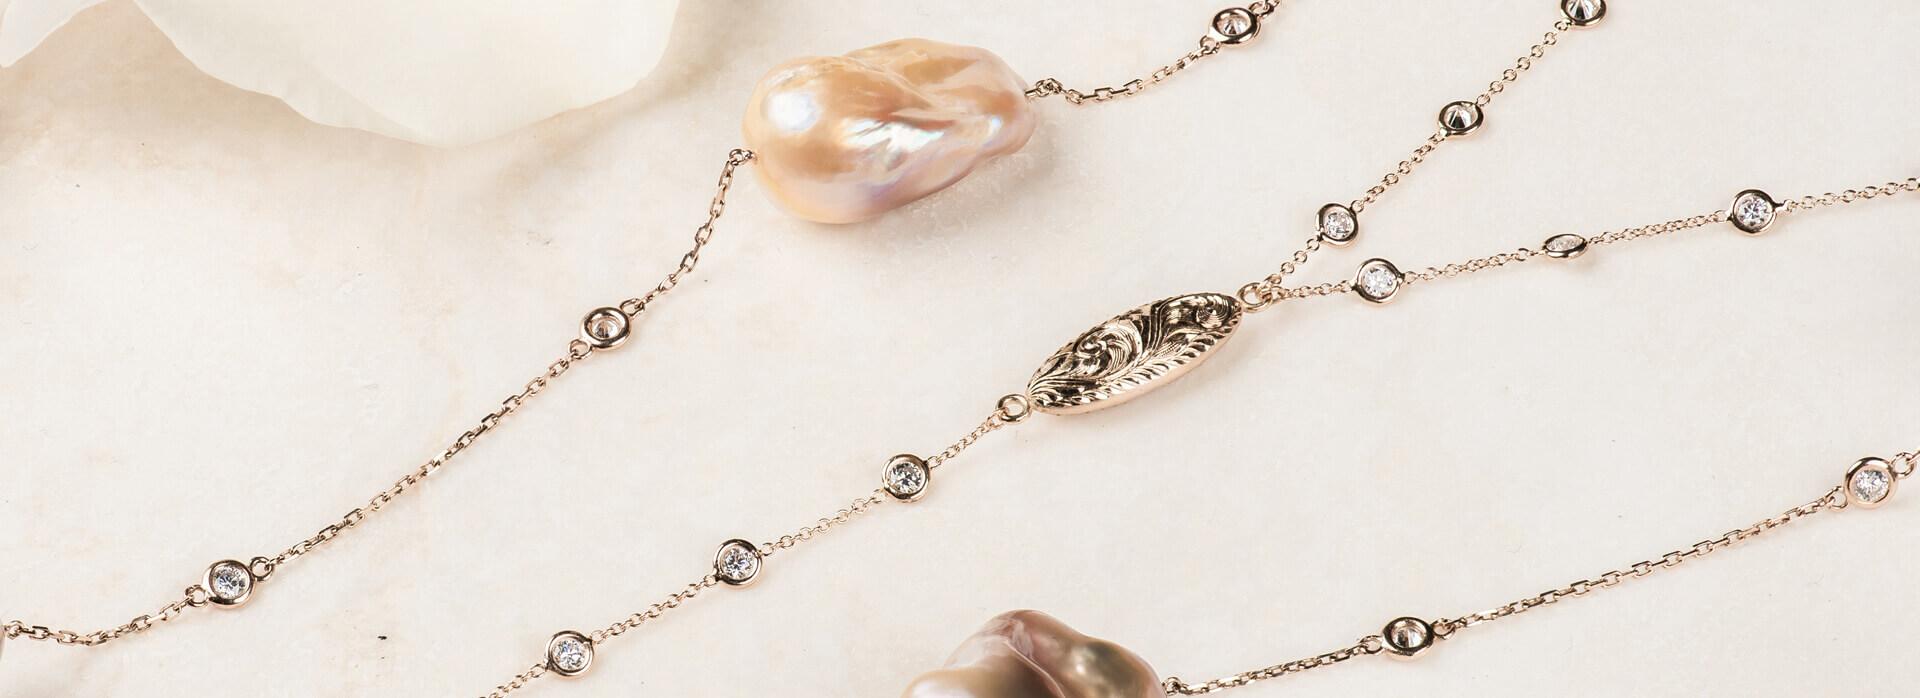 henri paul jewelry